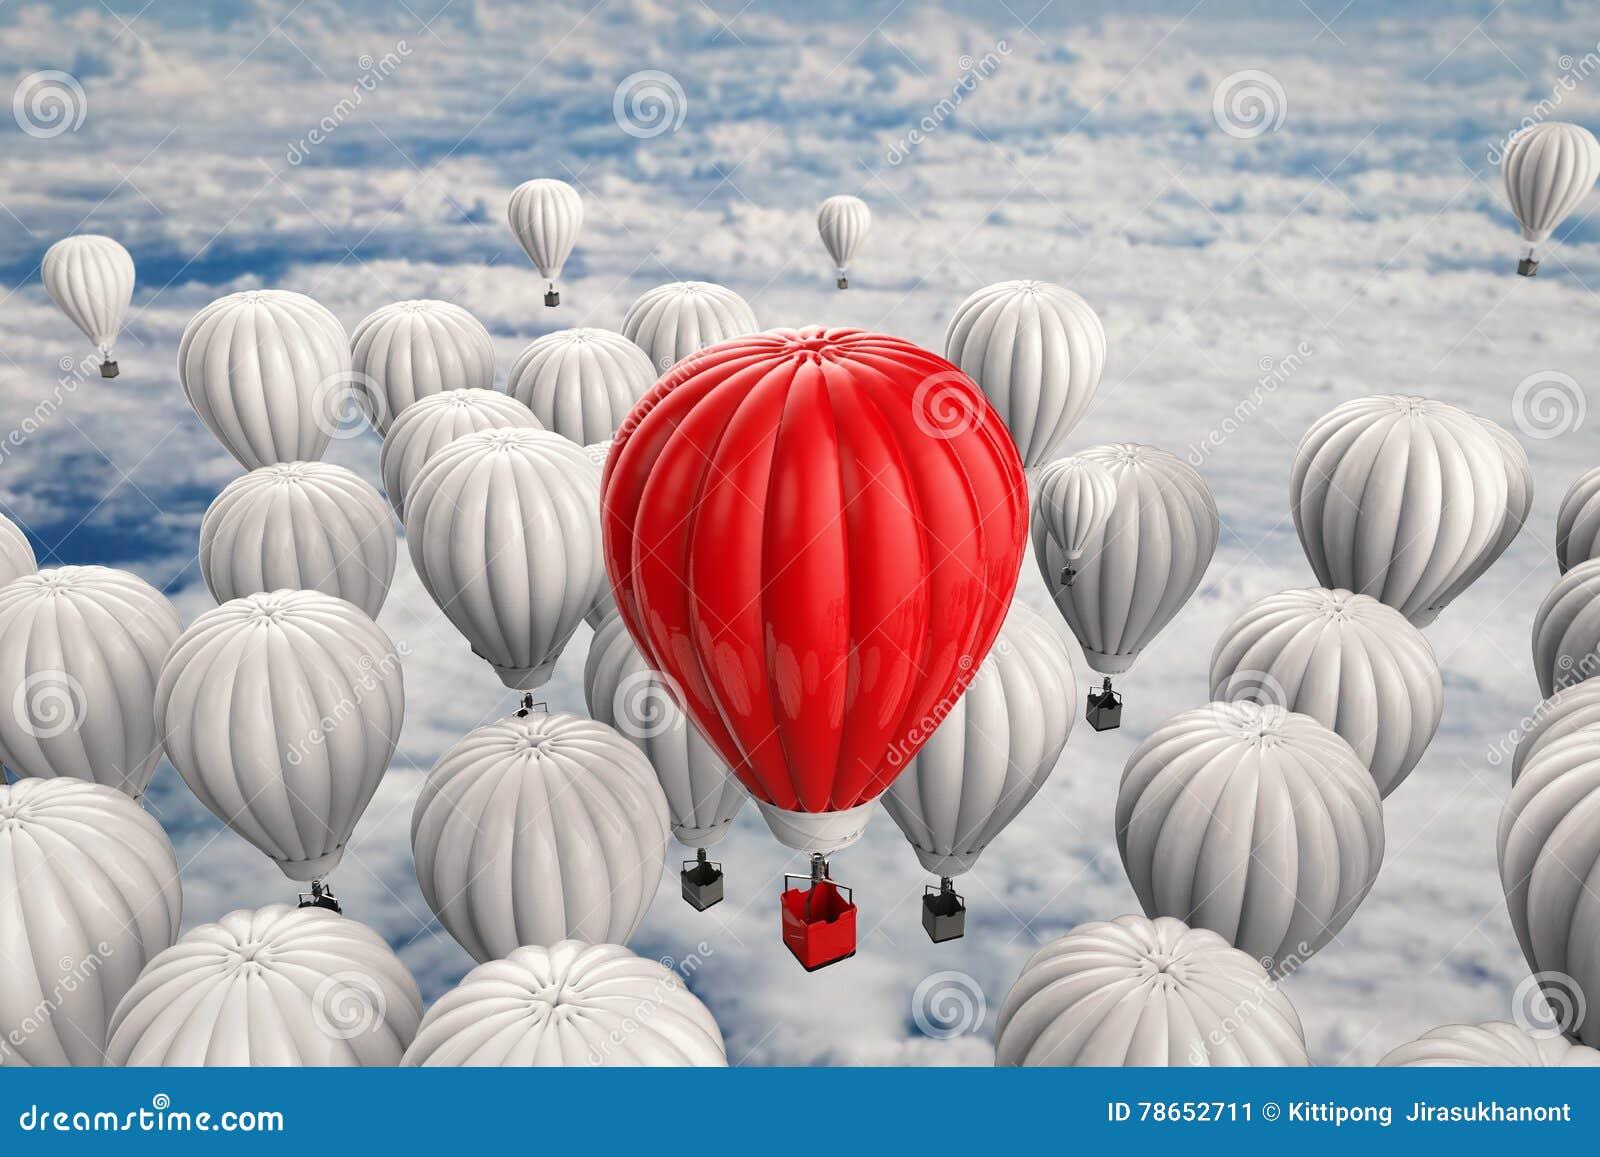 Ledarskapbegrepp med den glödheta luftballongen